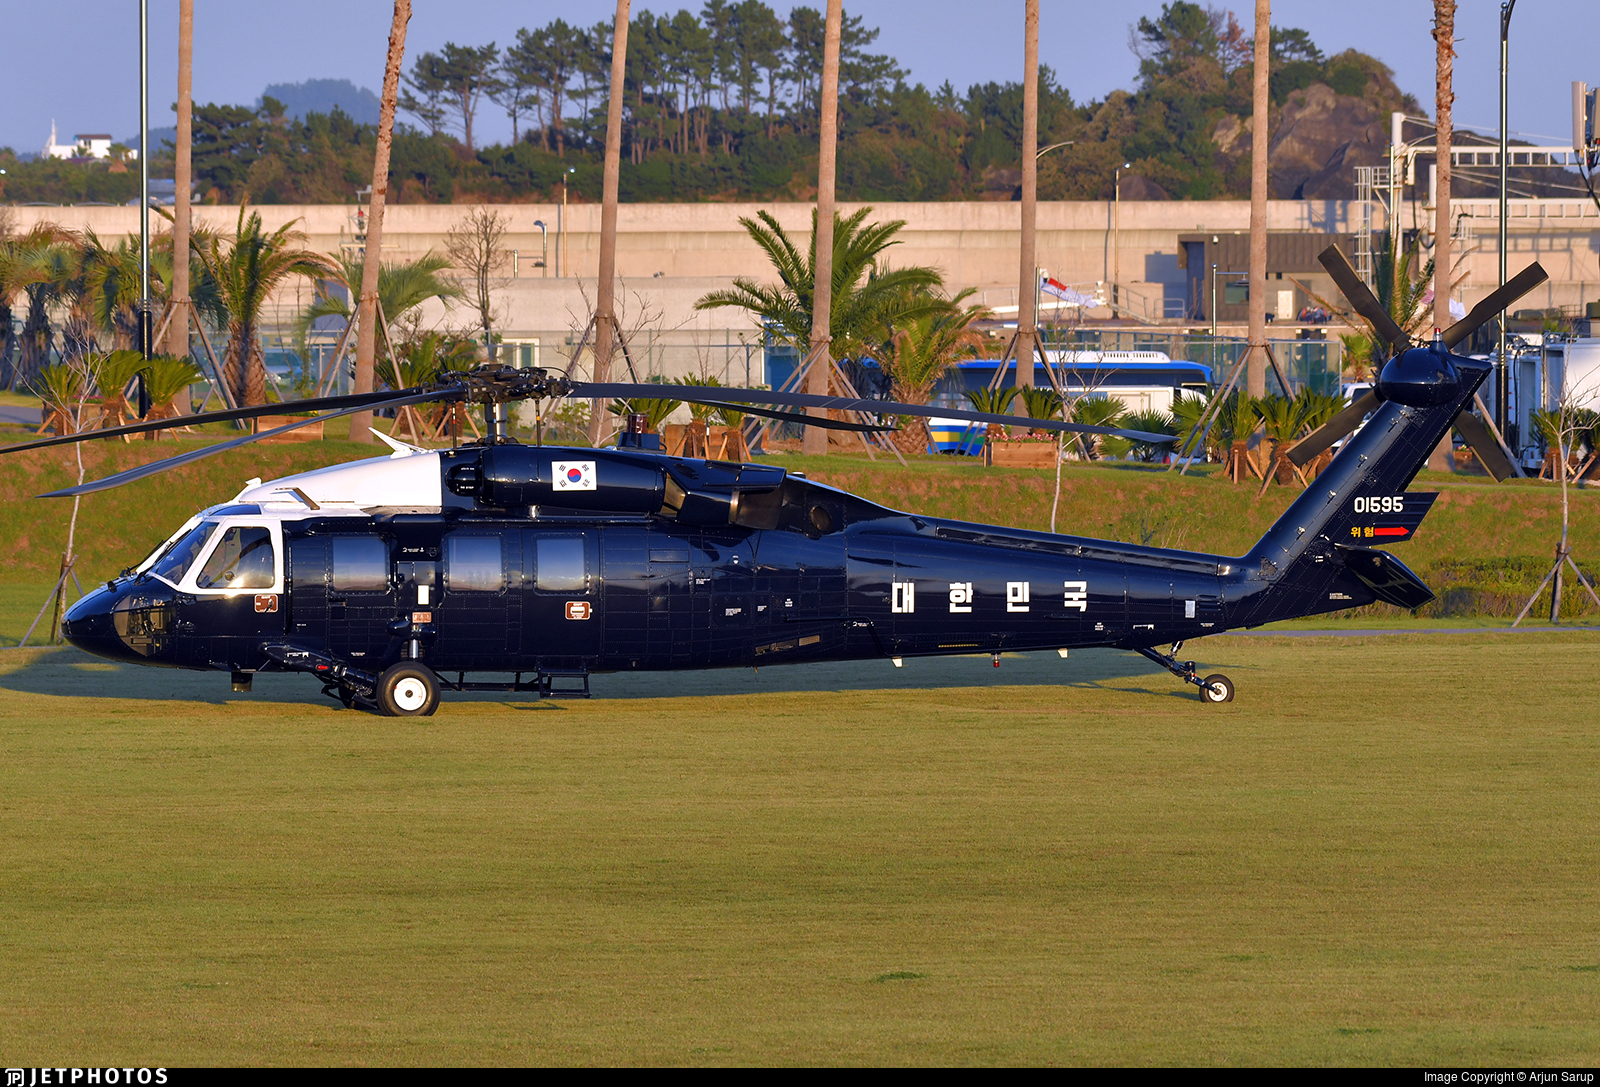 01595 - Sikorsky UH-60P Blackhawk - South Korea - Air Force